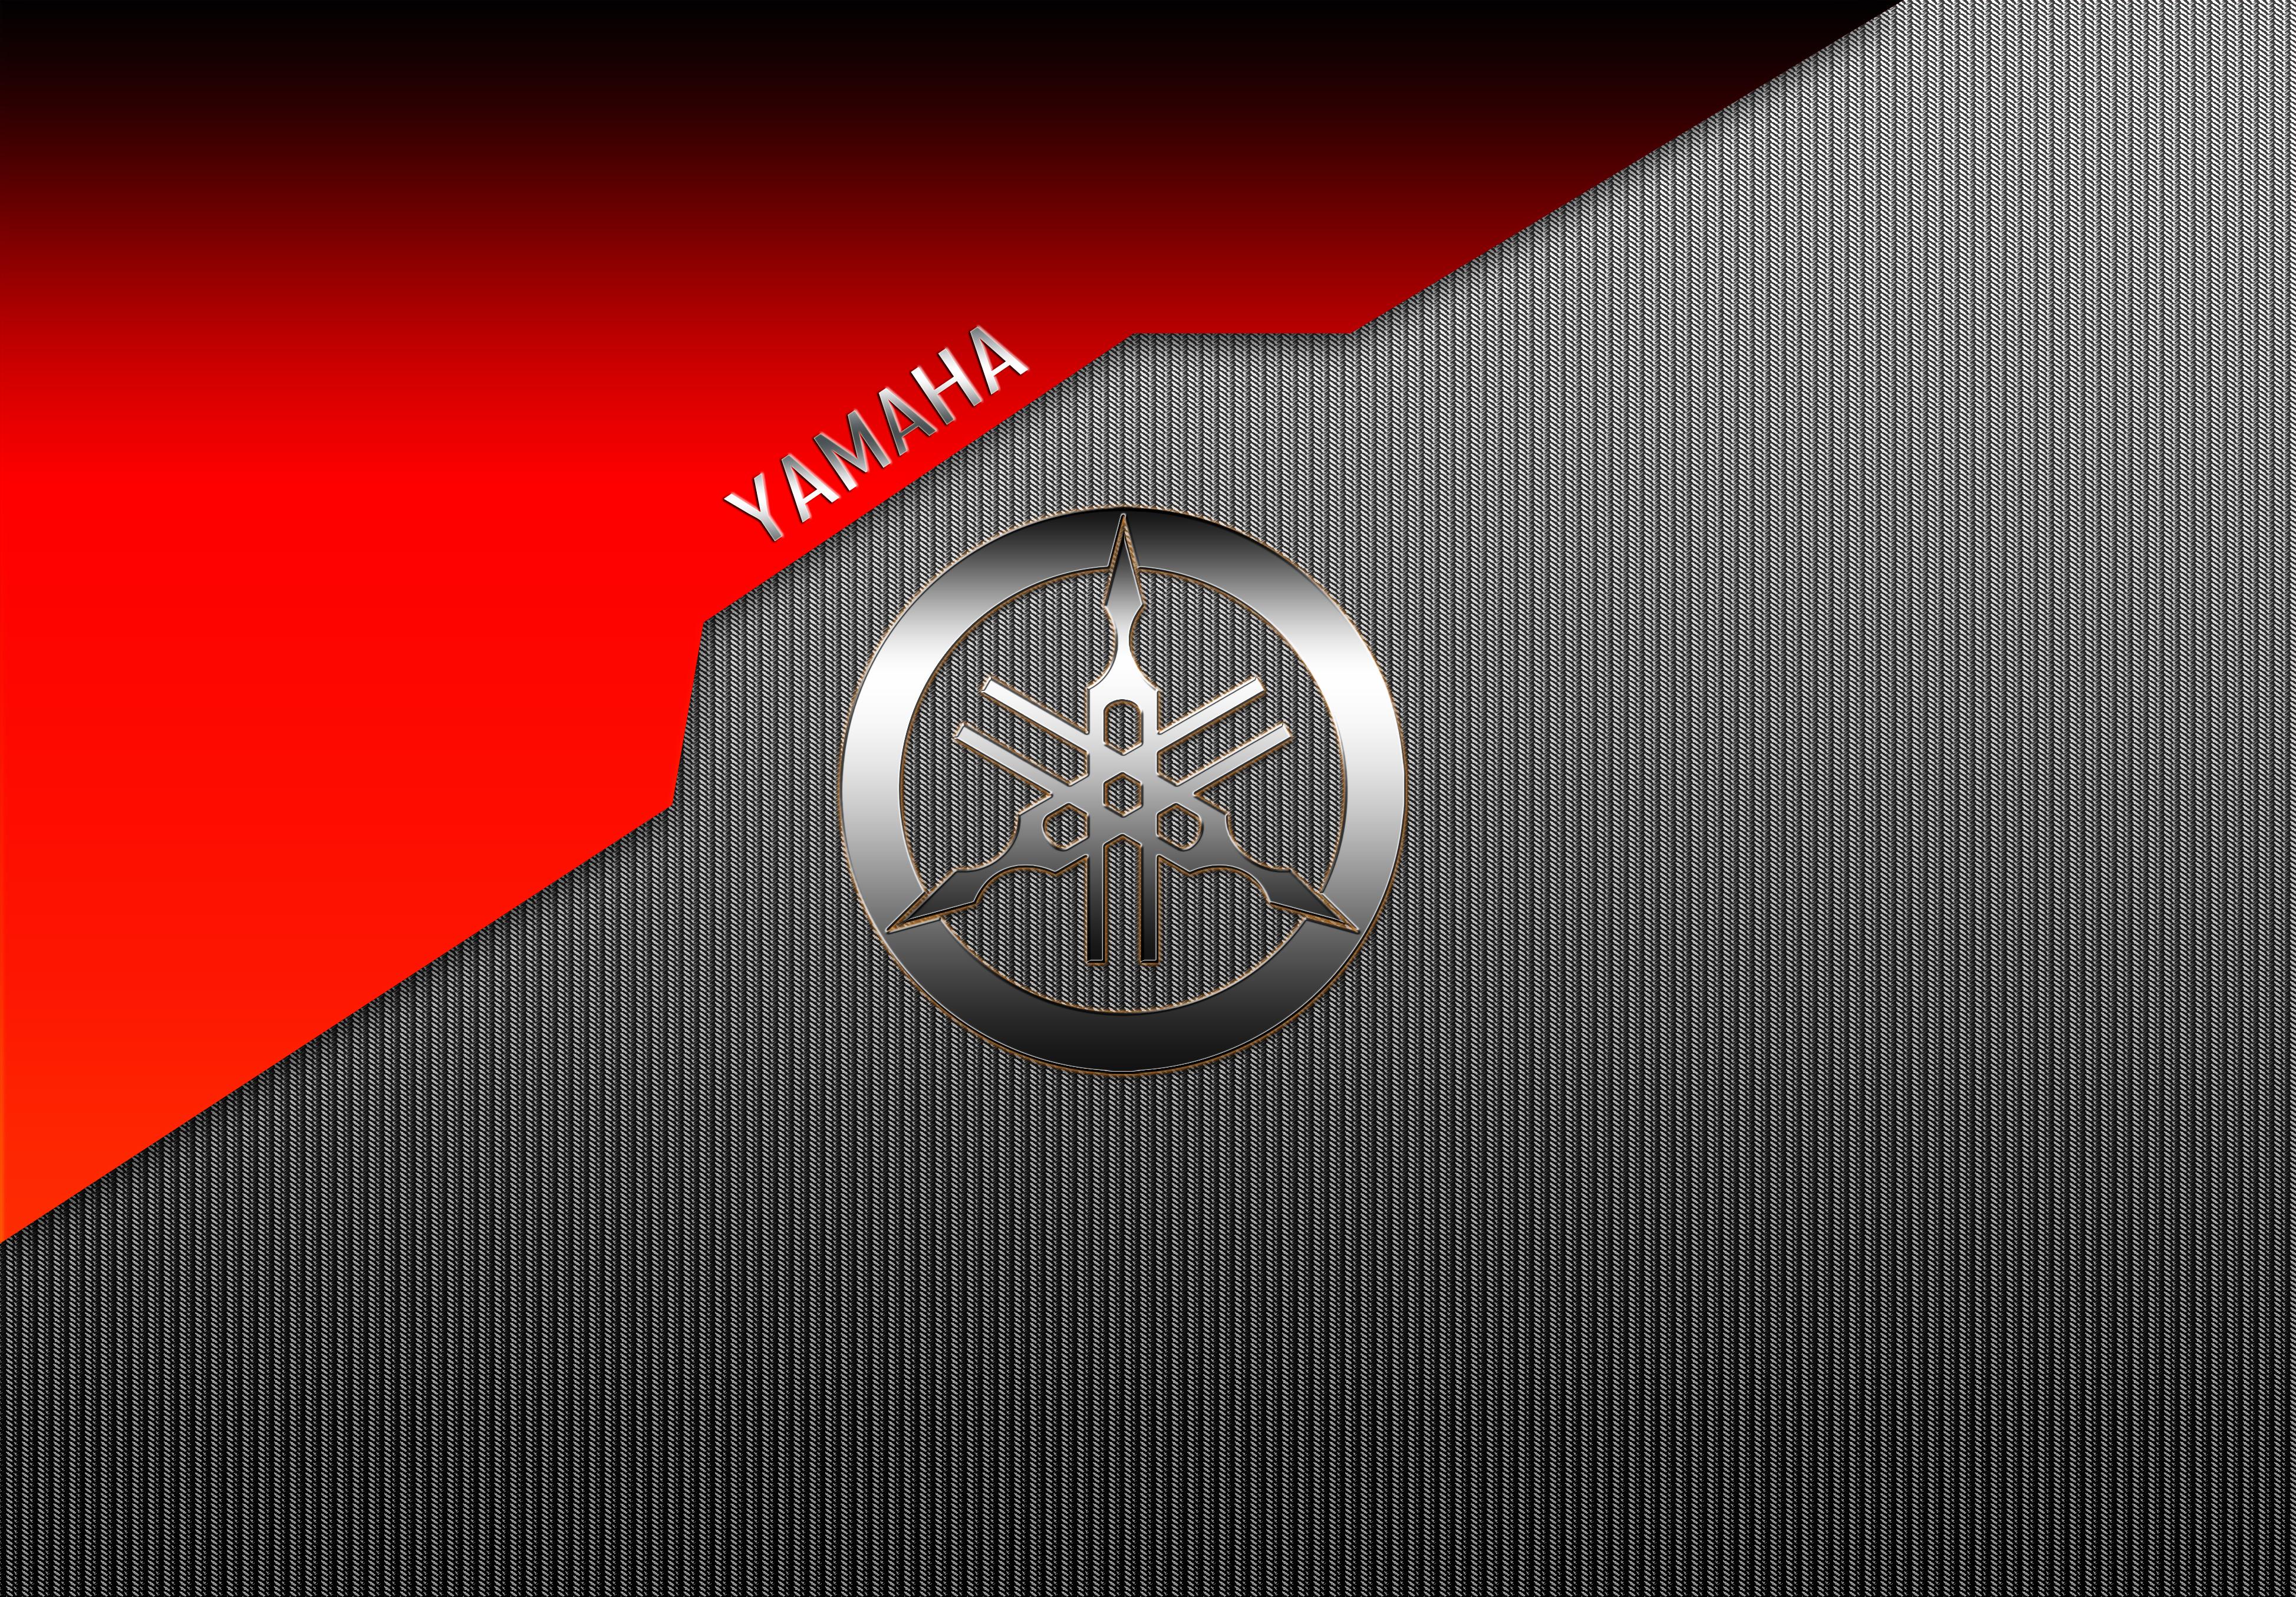 Yamaha Logo Wallpaper Yamaha Motor Wallpaper Yamaha R1 3895x2709